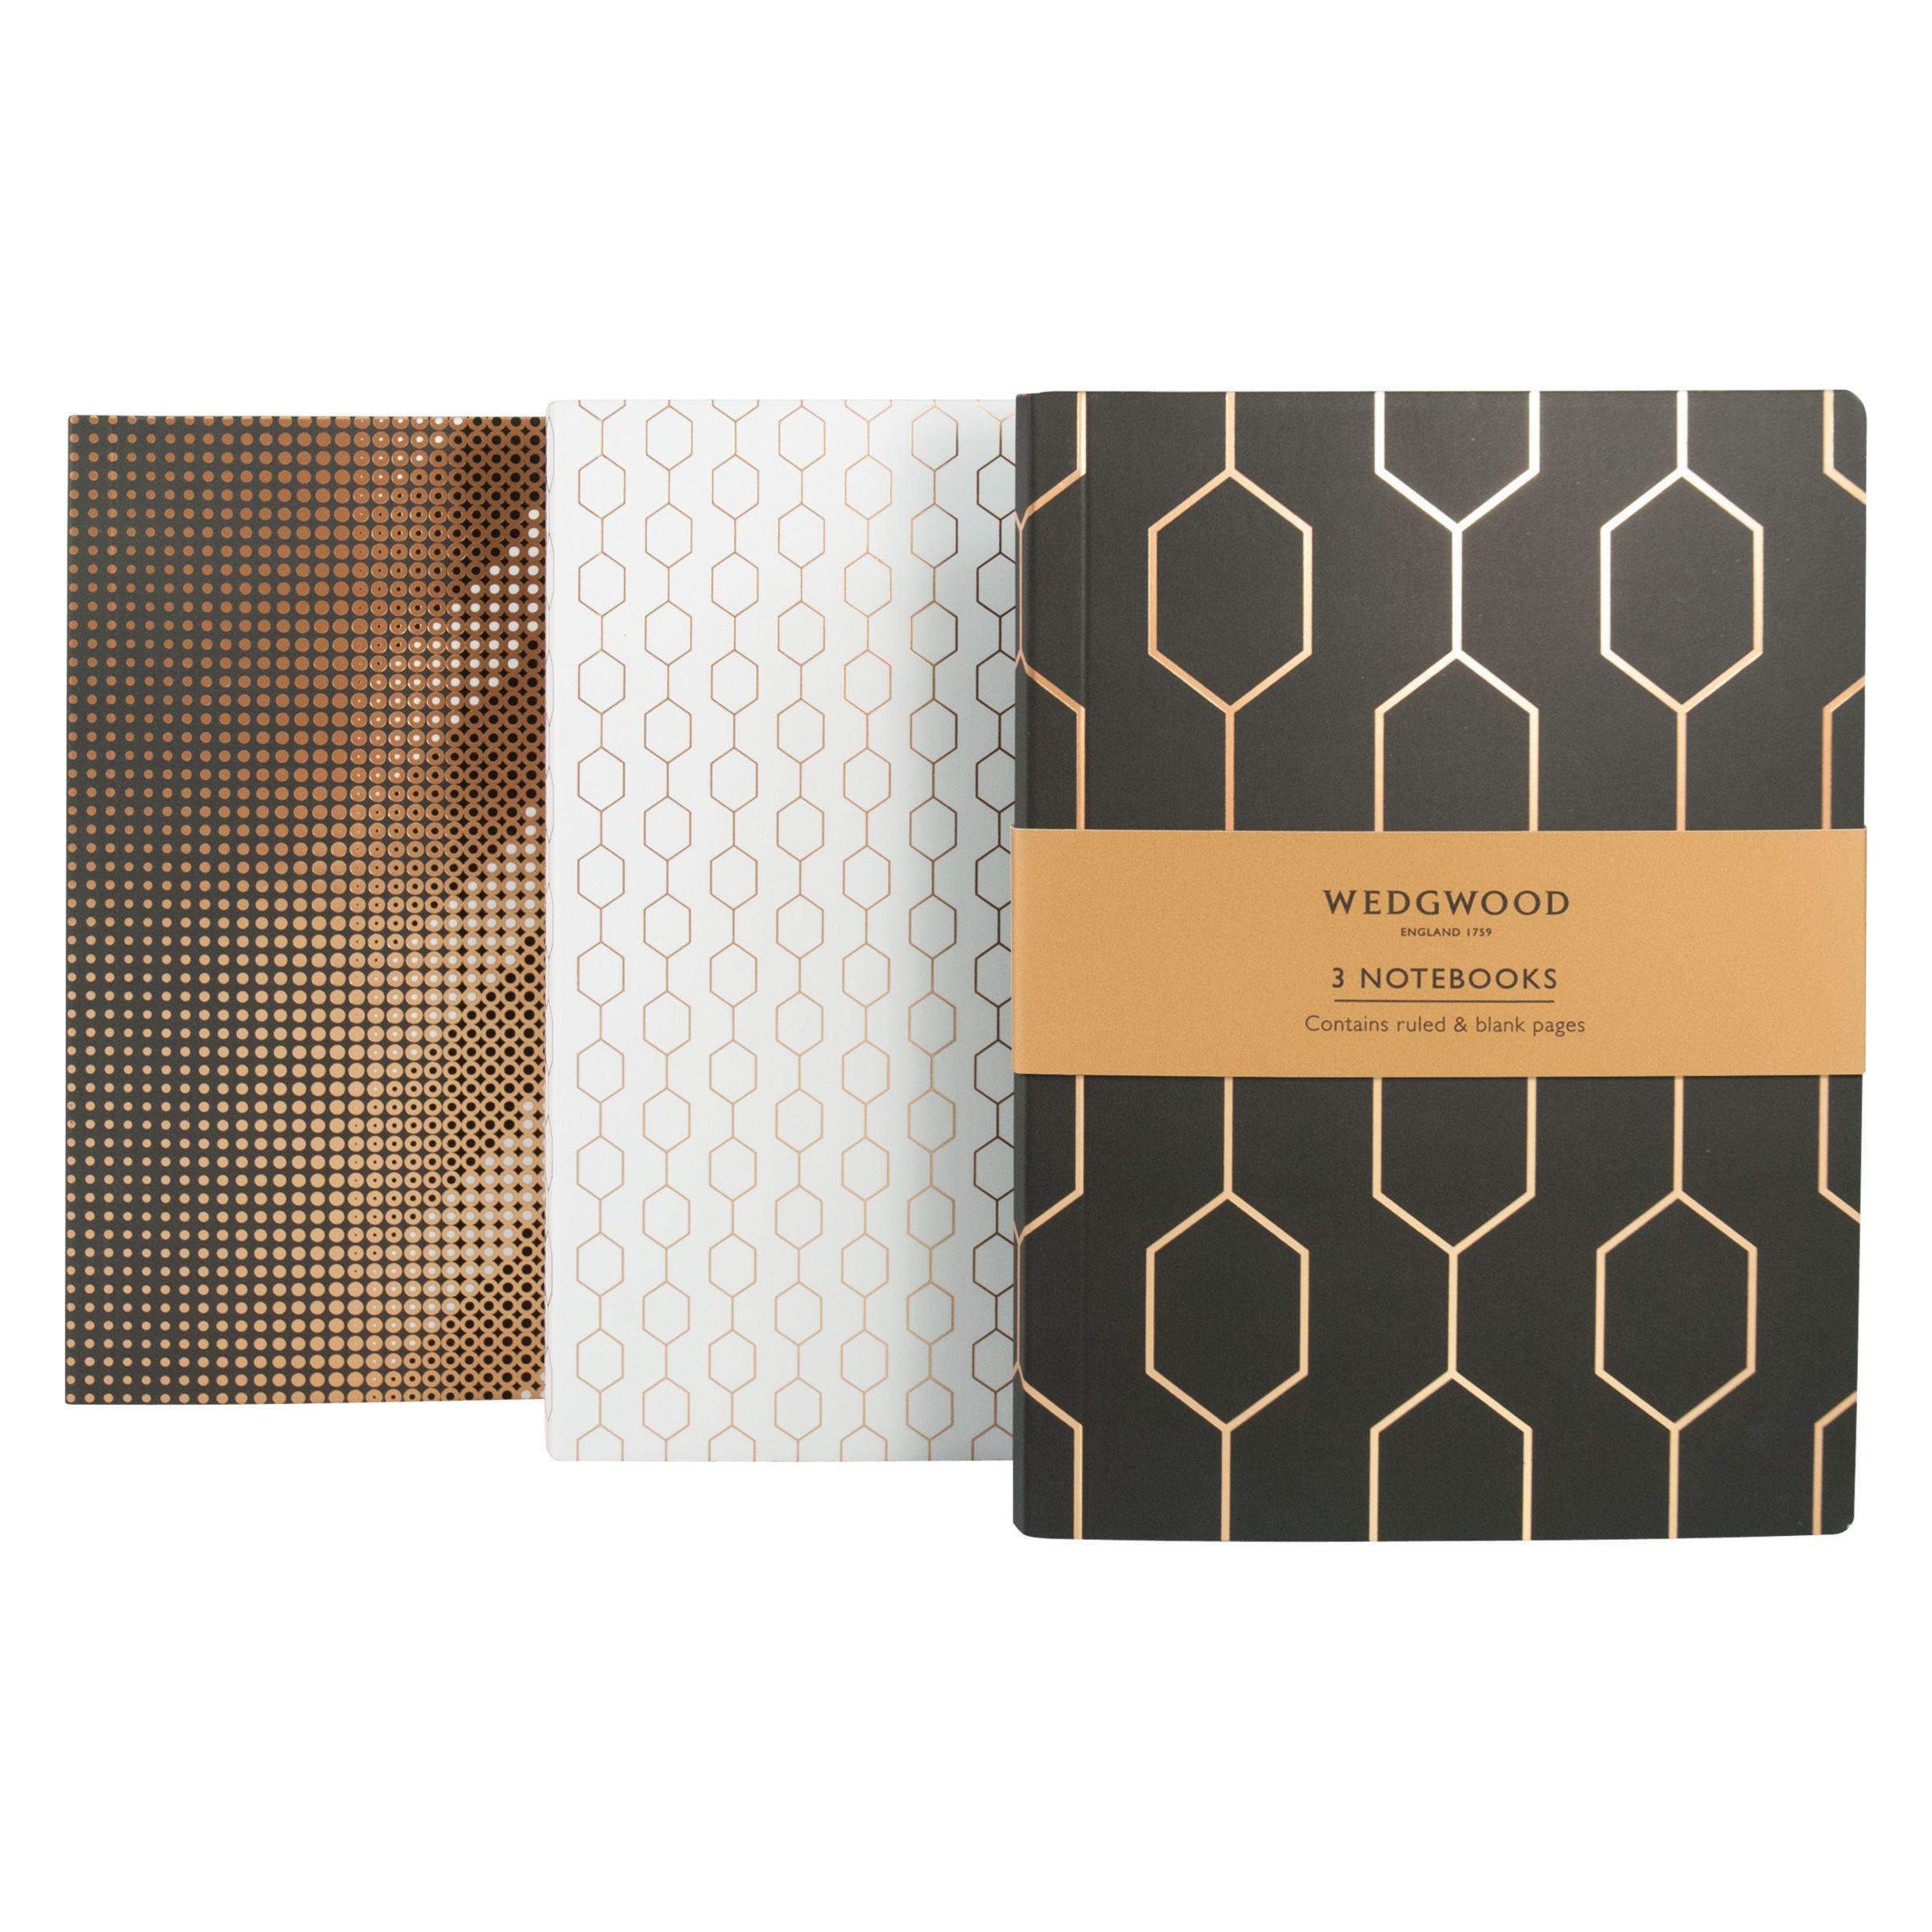 Wedgwood Wedgwood B5 Notebooks, Pack of 3